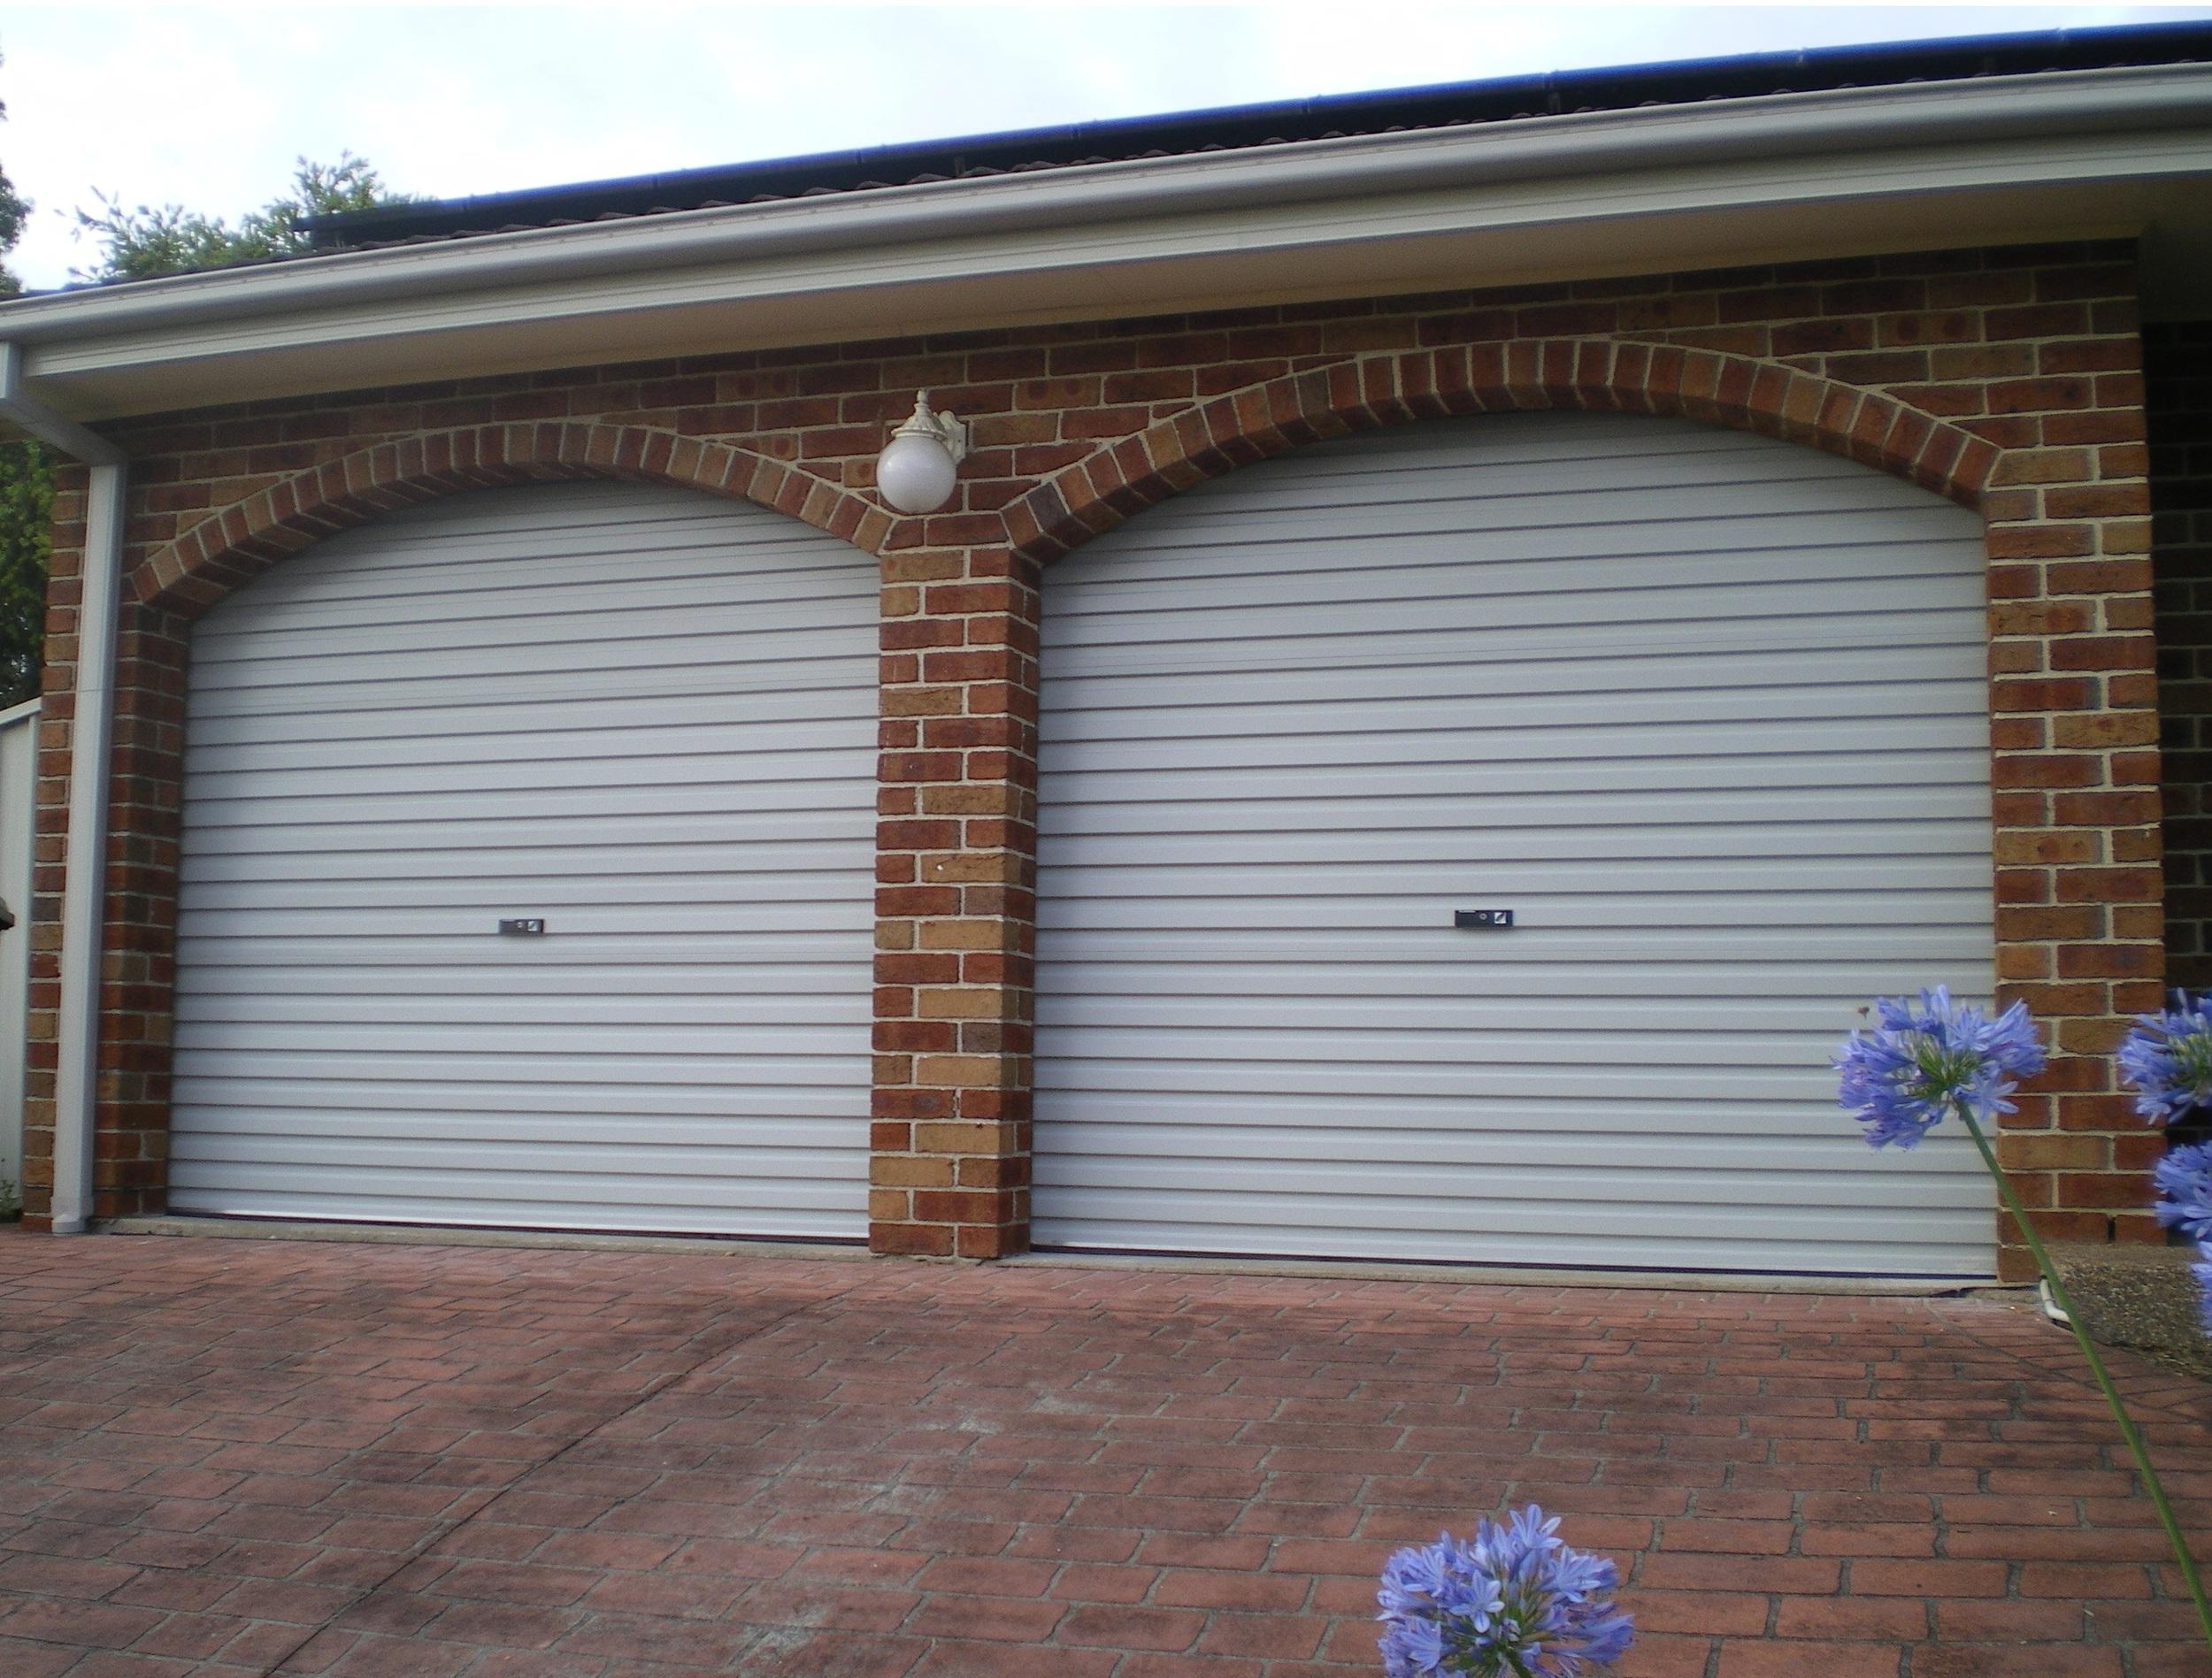 GLIDEROL SHALE GREY ROLLER DOORS (CLICK TO ENLARGE)